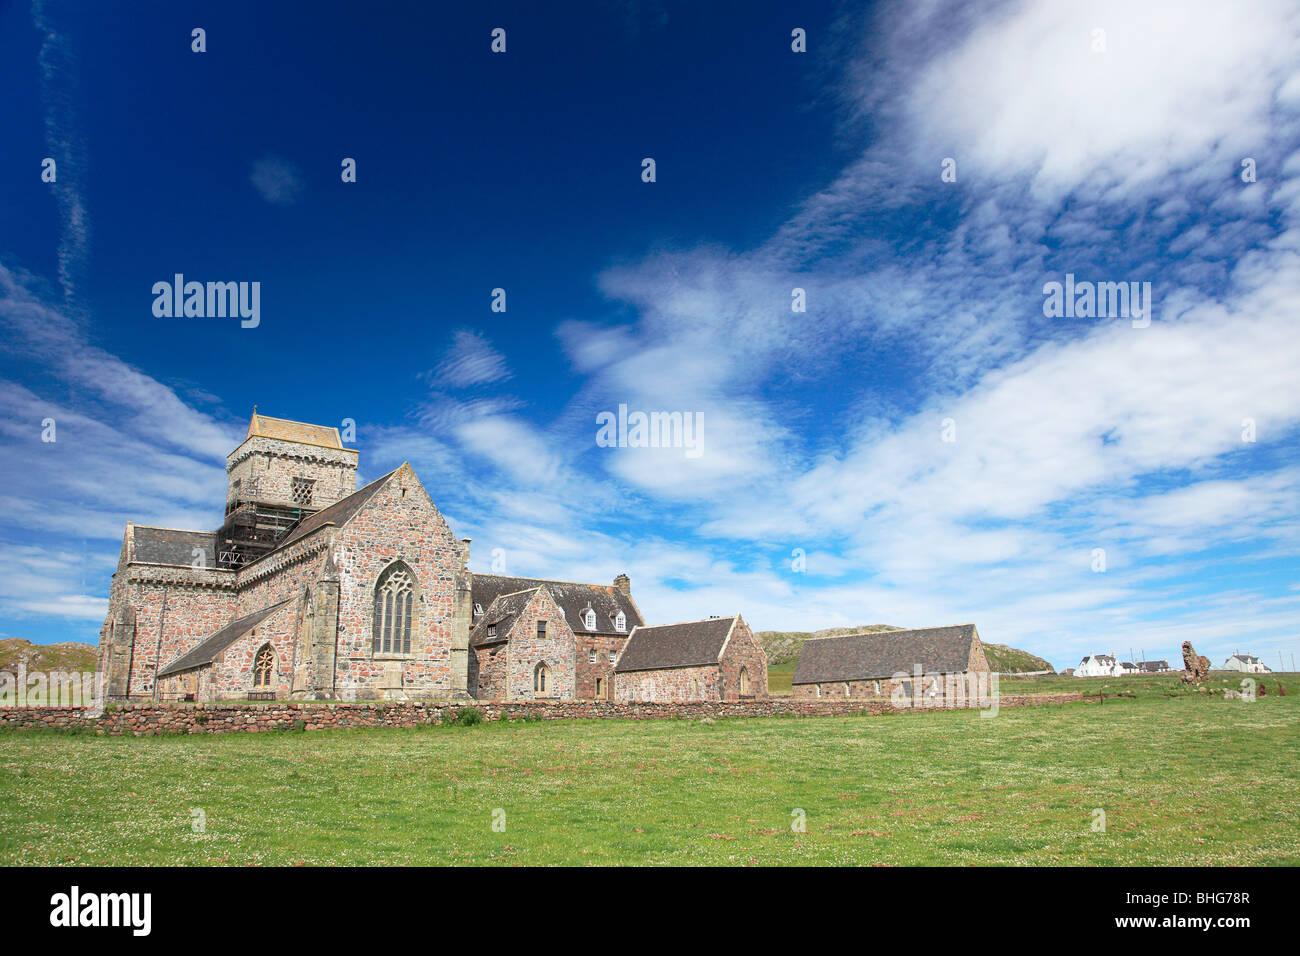 Iona abbey - Stock Image